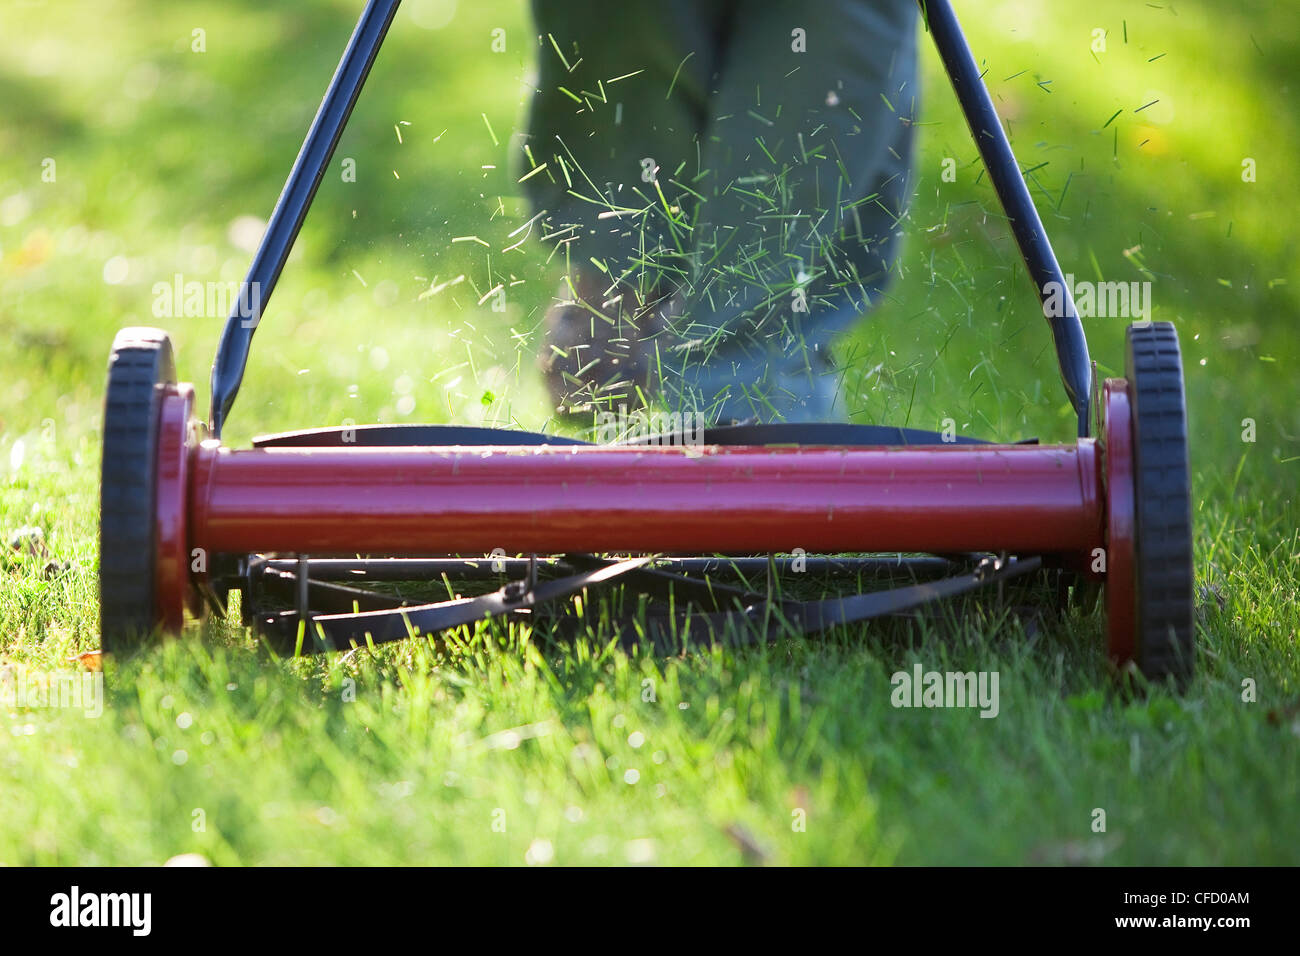 Frau mit umweltfreundliche Rasenmäher Rasen zu mähen. Winnipeg, Manitoba, Kanada. Stockbild